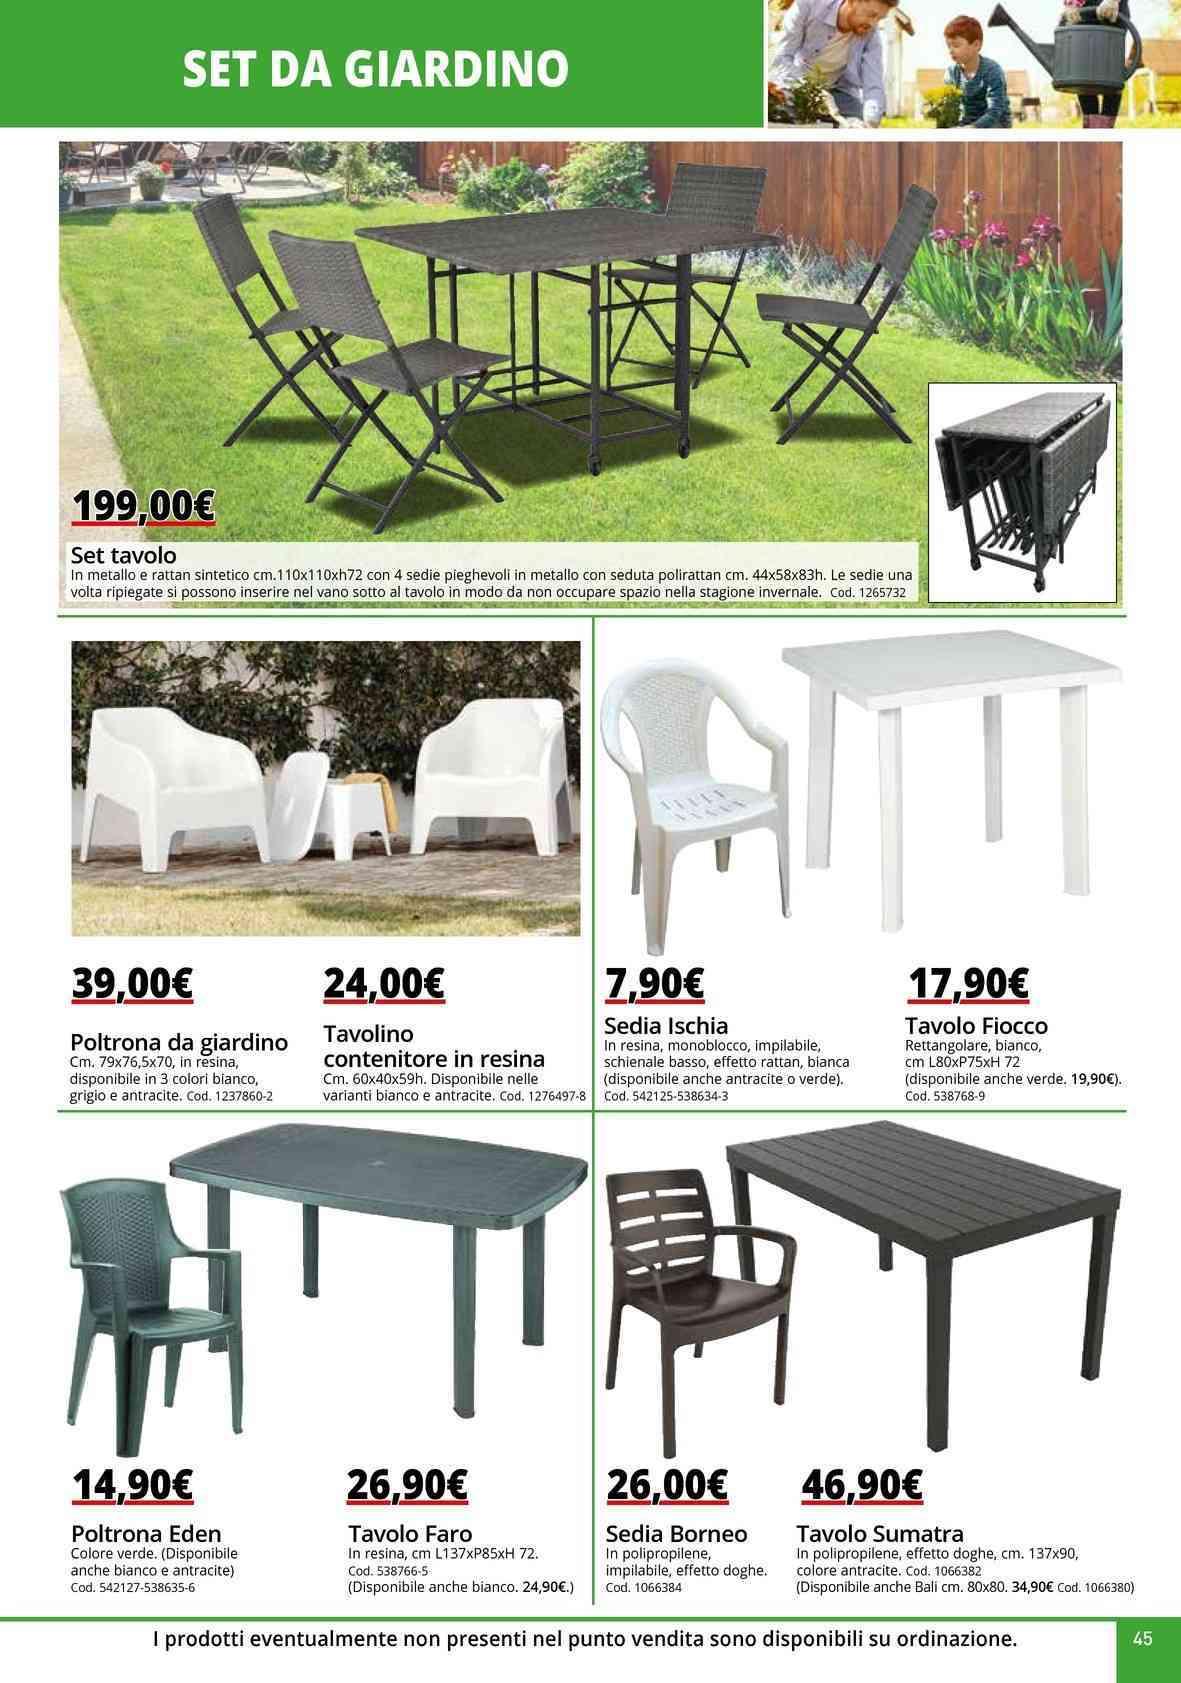 Leroy Merlin Mobili Da Balcone offerte tavoli da giardino nel volantino, prezzi negozio